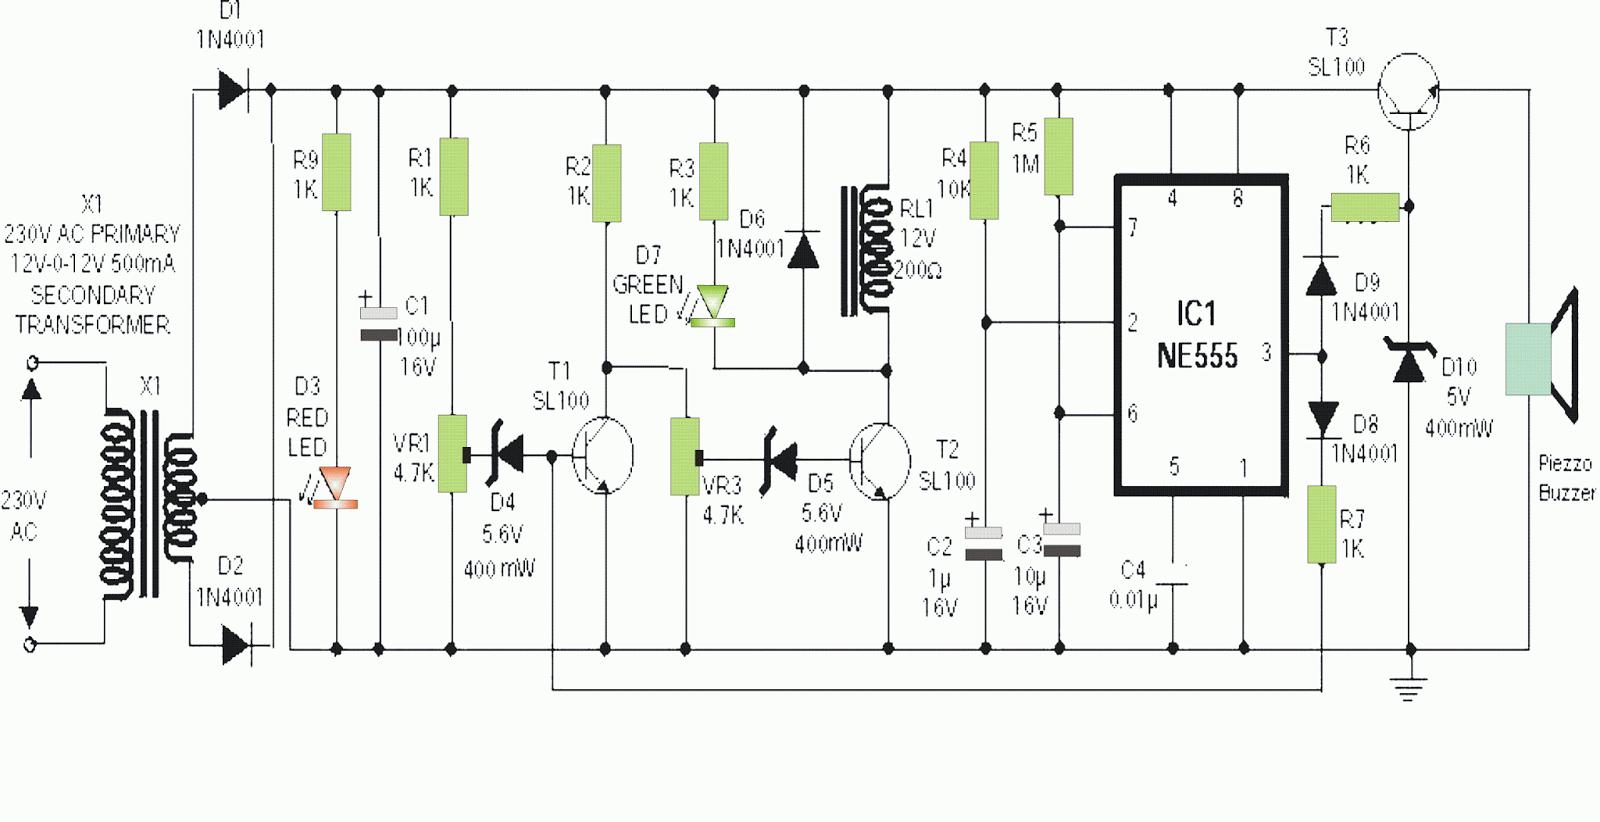 Simple Mains High Low Voltage Cut-off Circuit | Schematics Lab